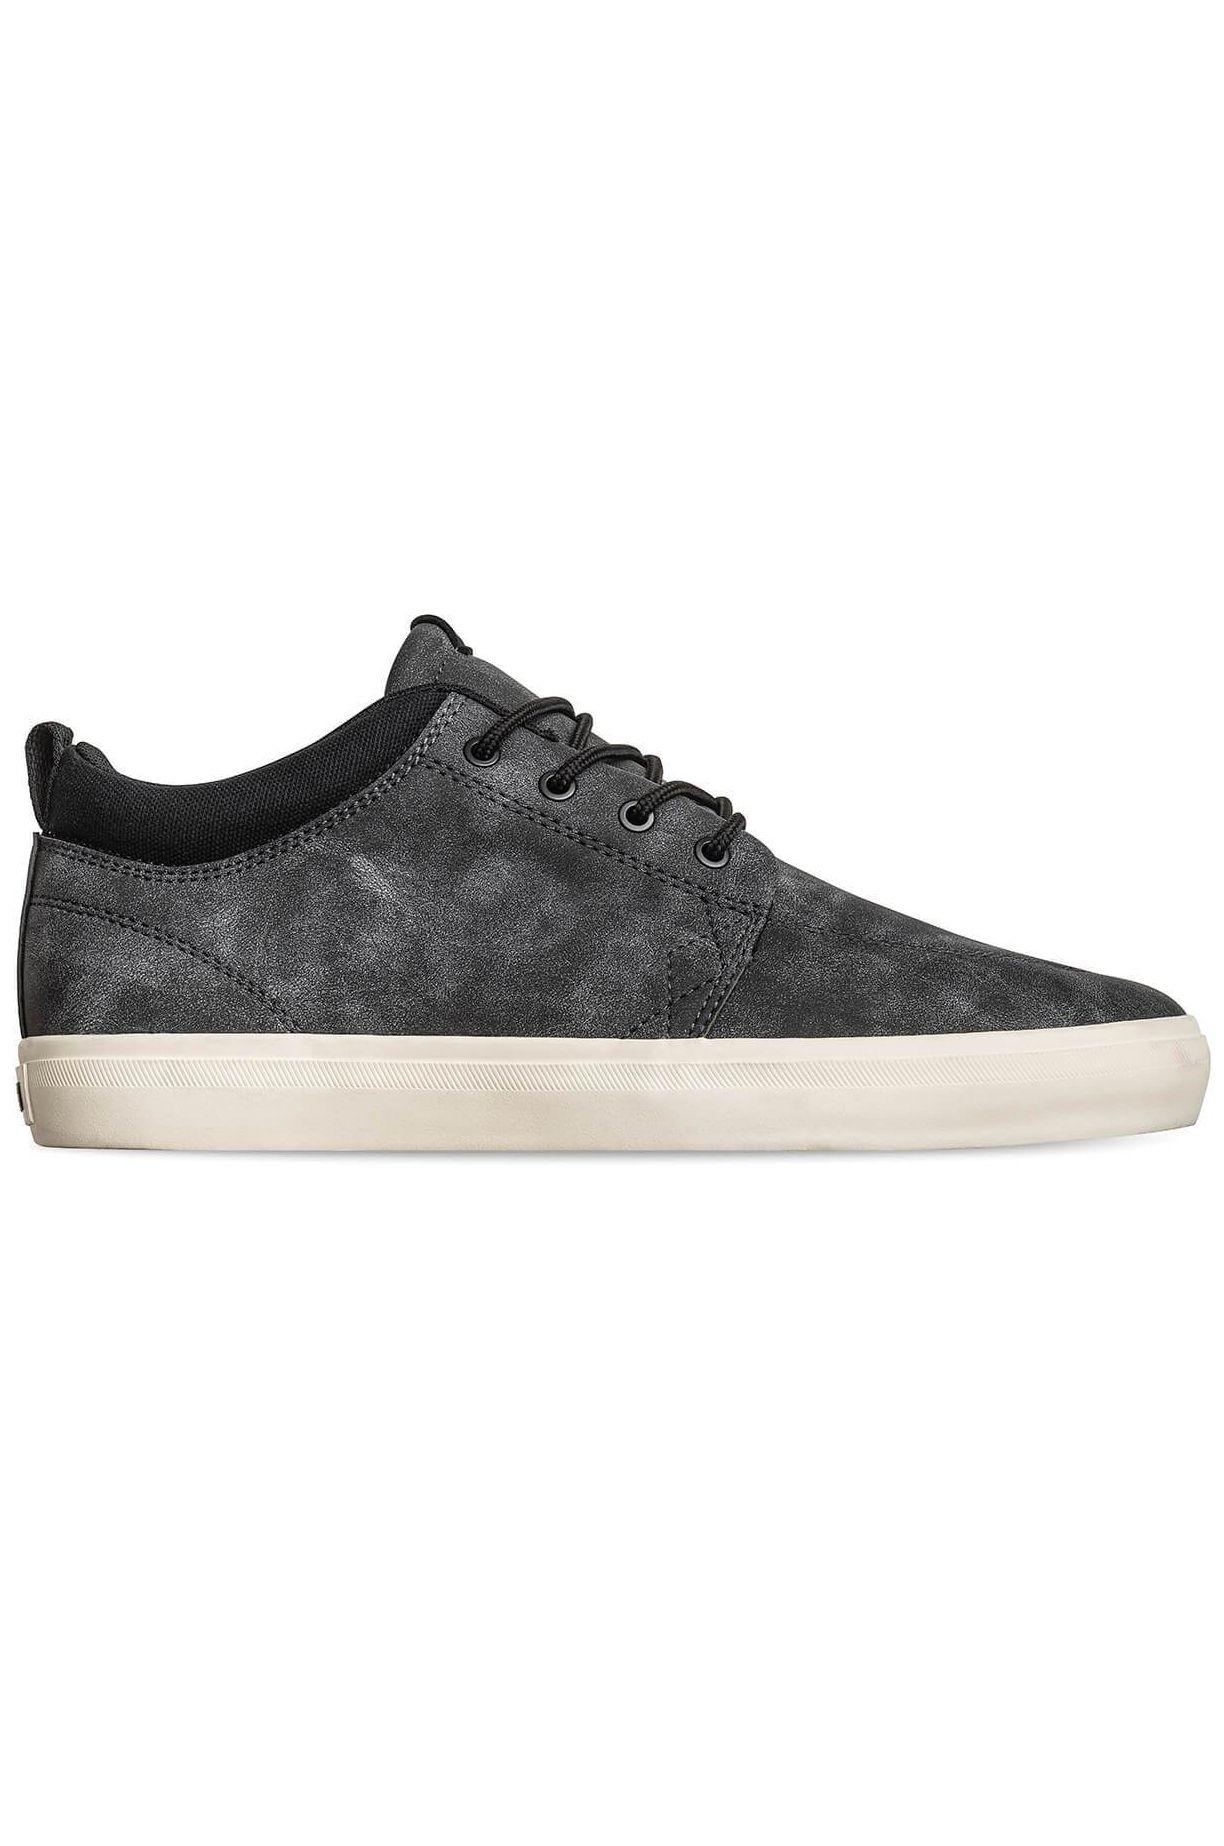 Globe Shoes GS CHUKKA Washed Black